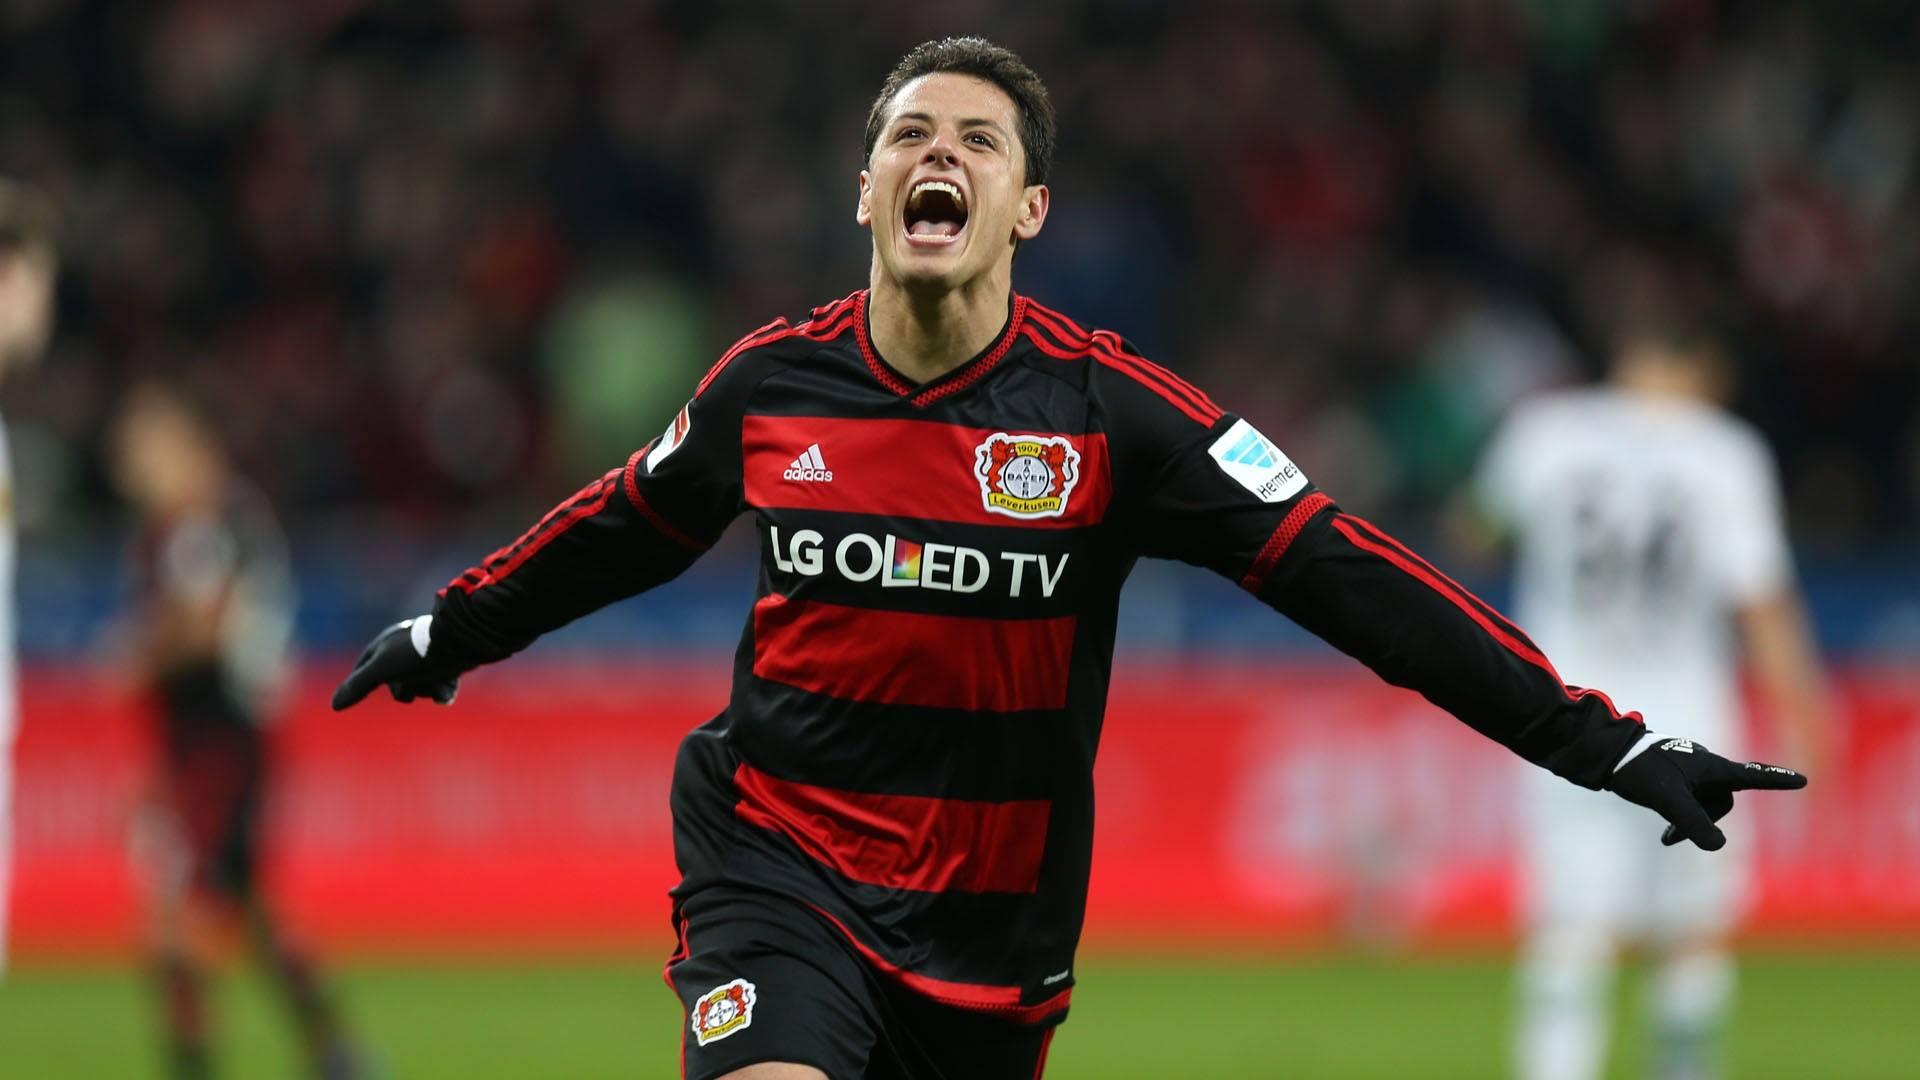 Chicharito Leads The Starting Lineup Of This Year's Bundesliga